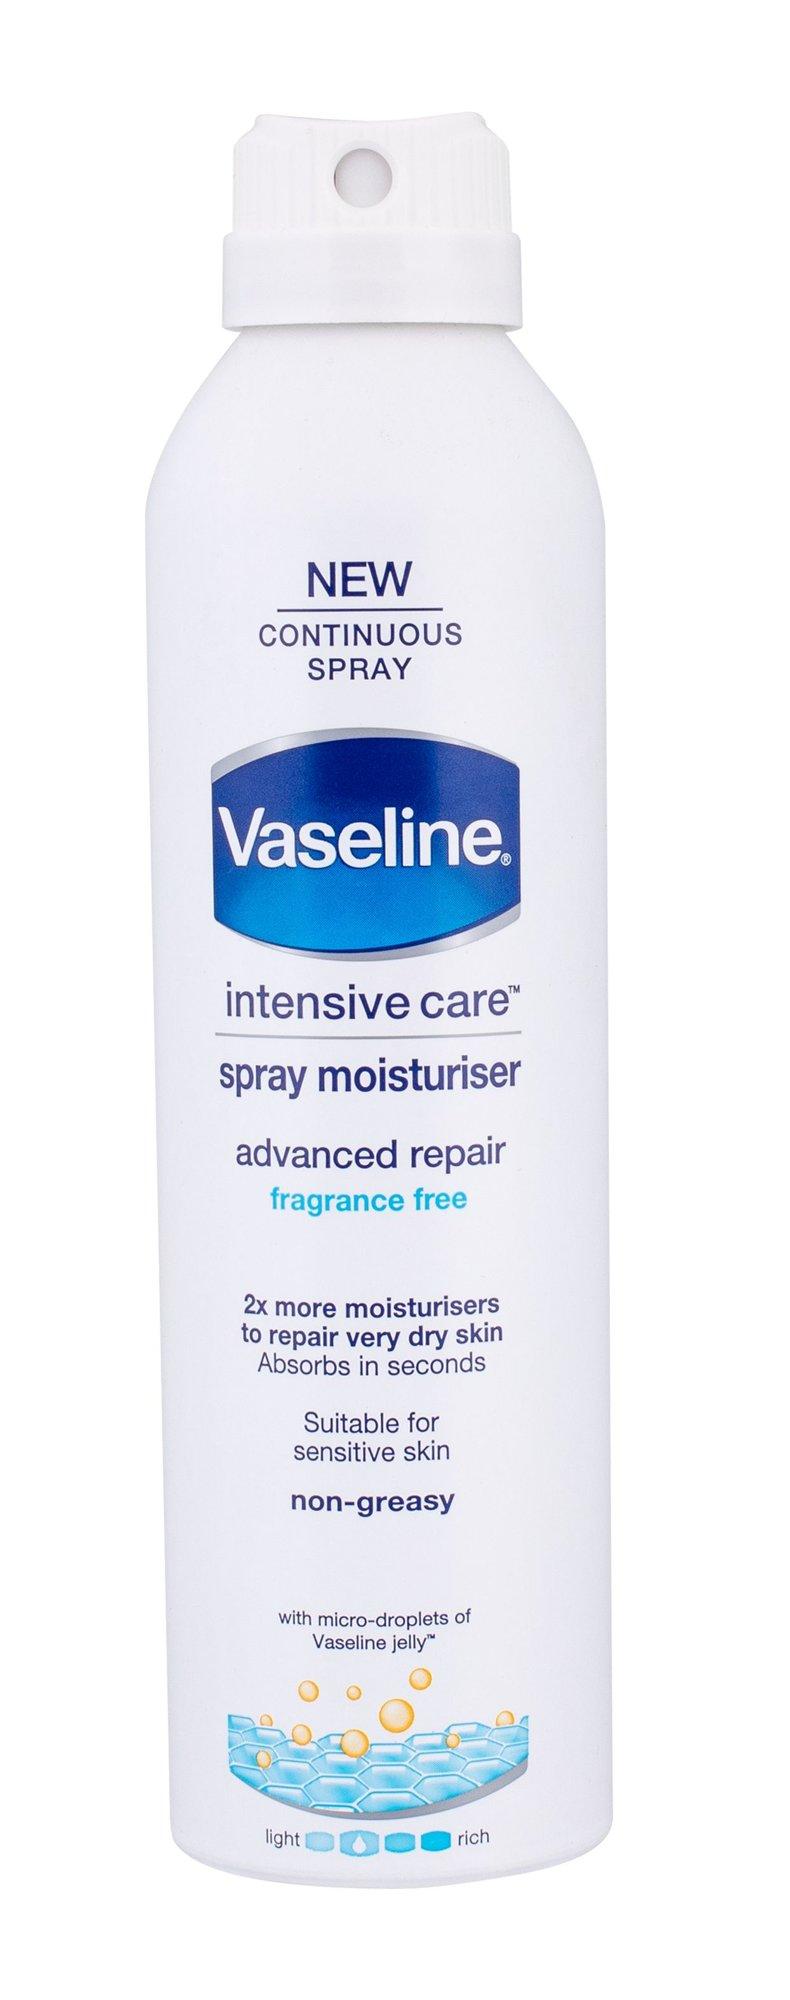 Vaseline Intensive Care Advanced Repair Spray Moisturiser Cosmetic 190ml